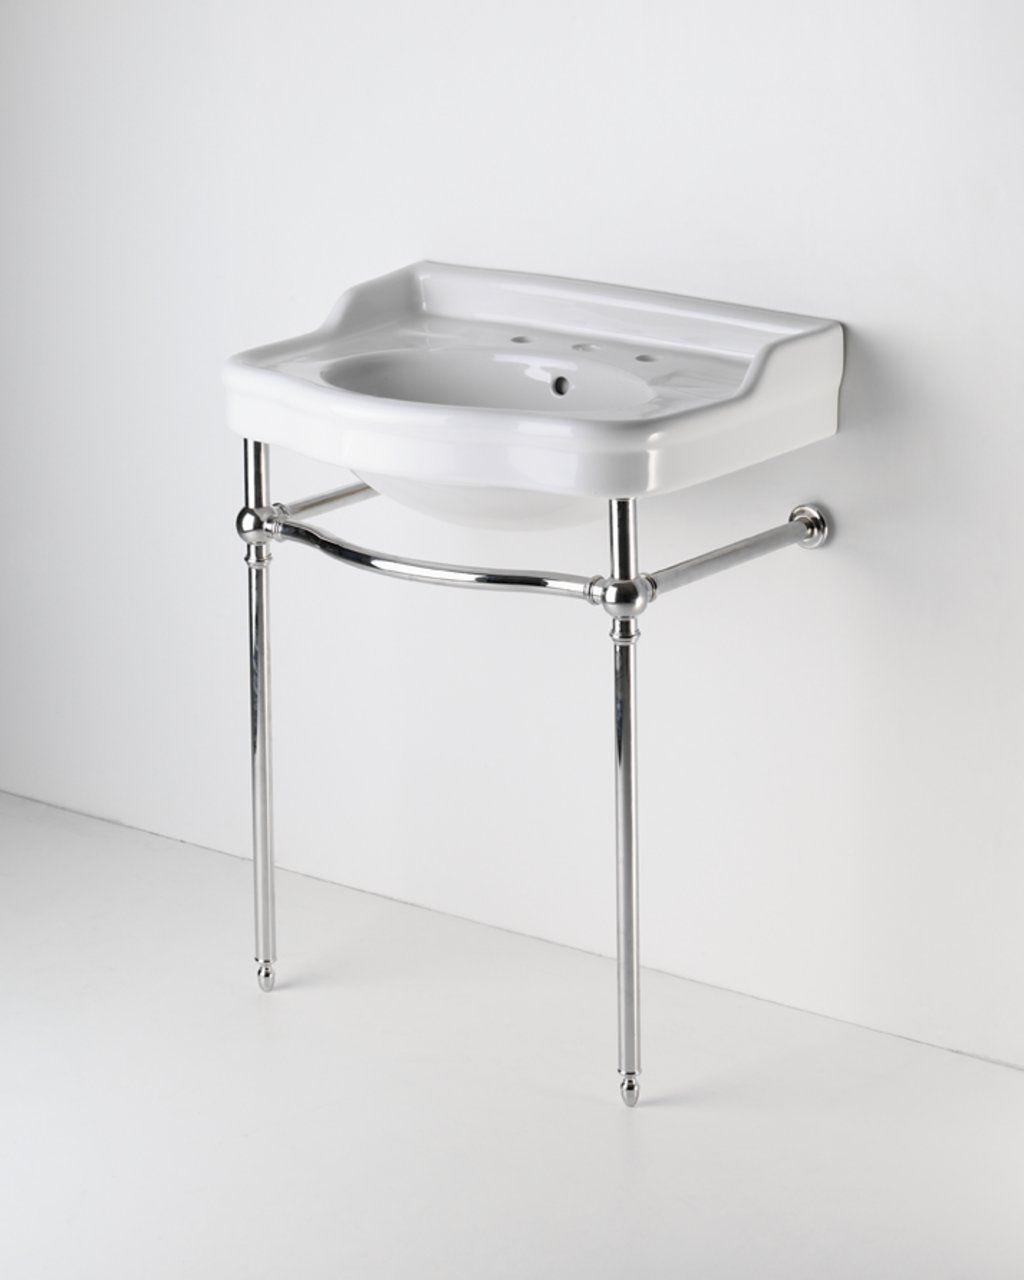 ... Gorgeous Design Ideas 20 Metal Bathroom Sink Console Sink With Metal  Legs ...